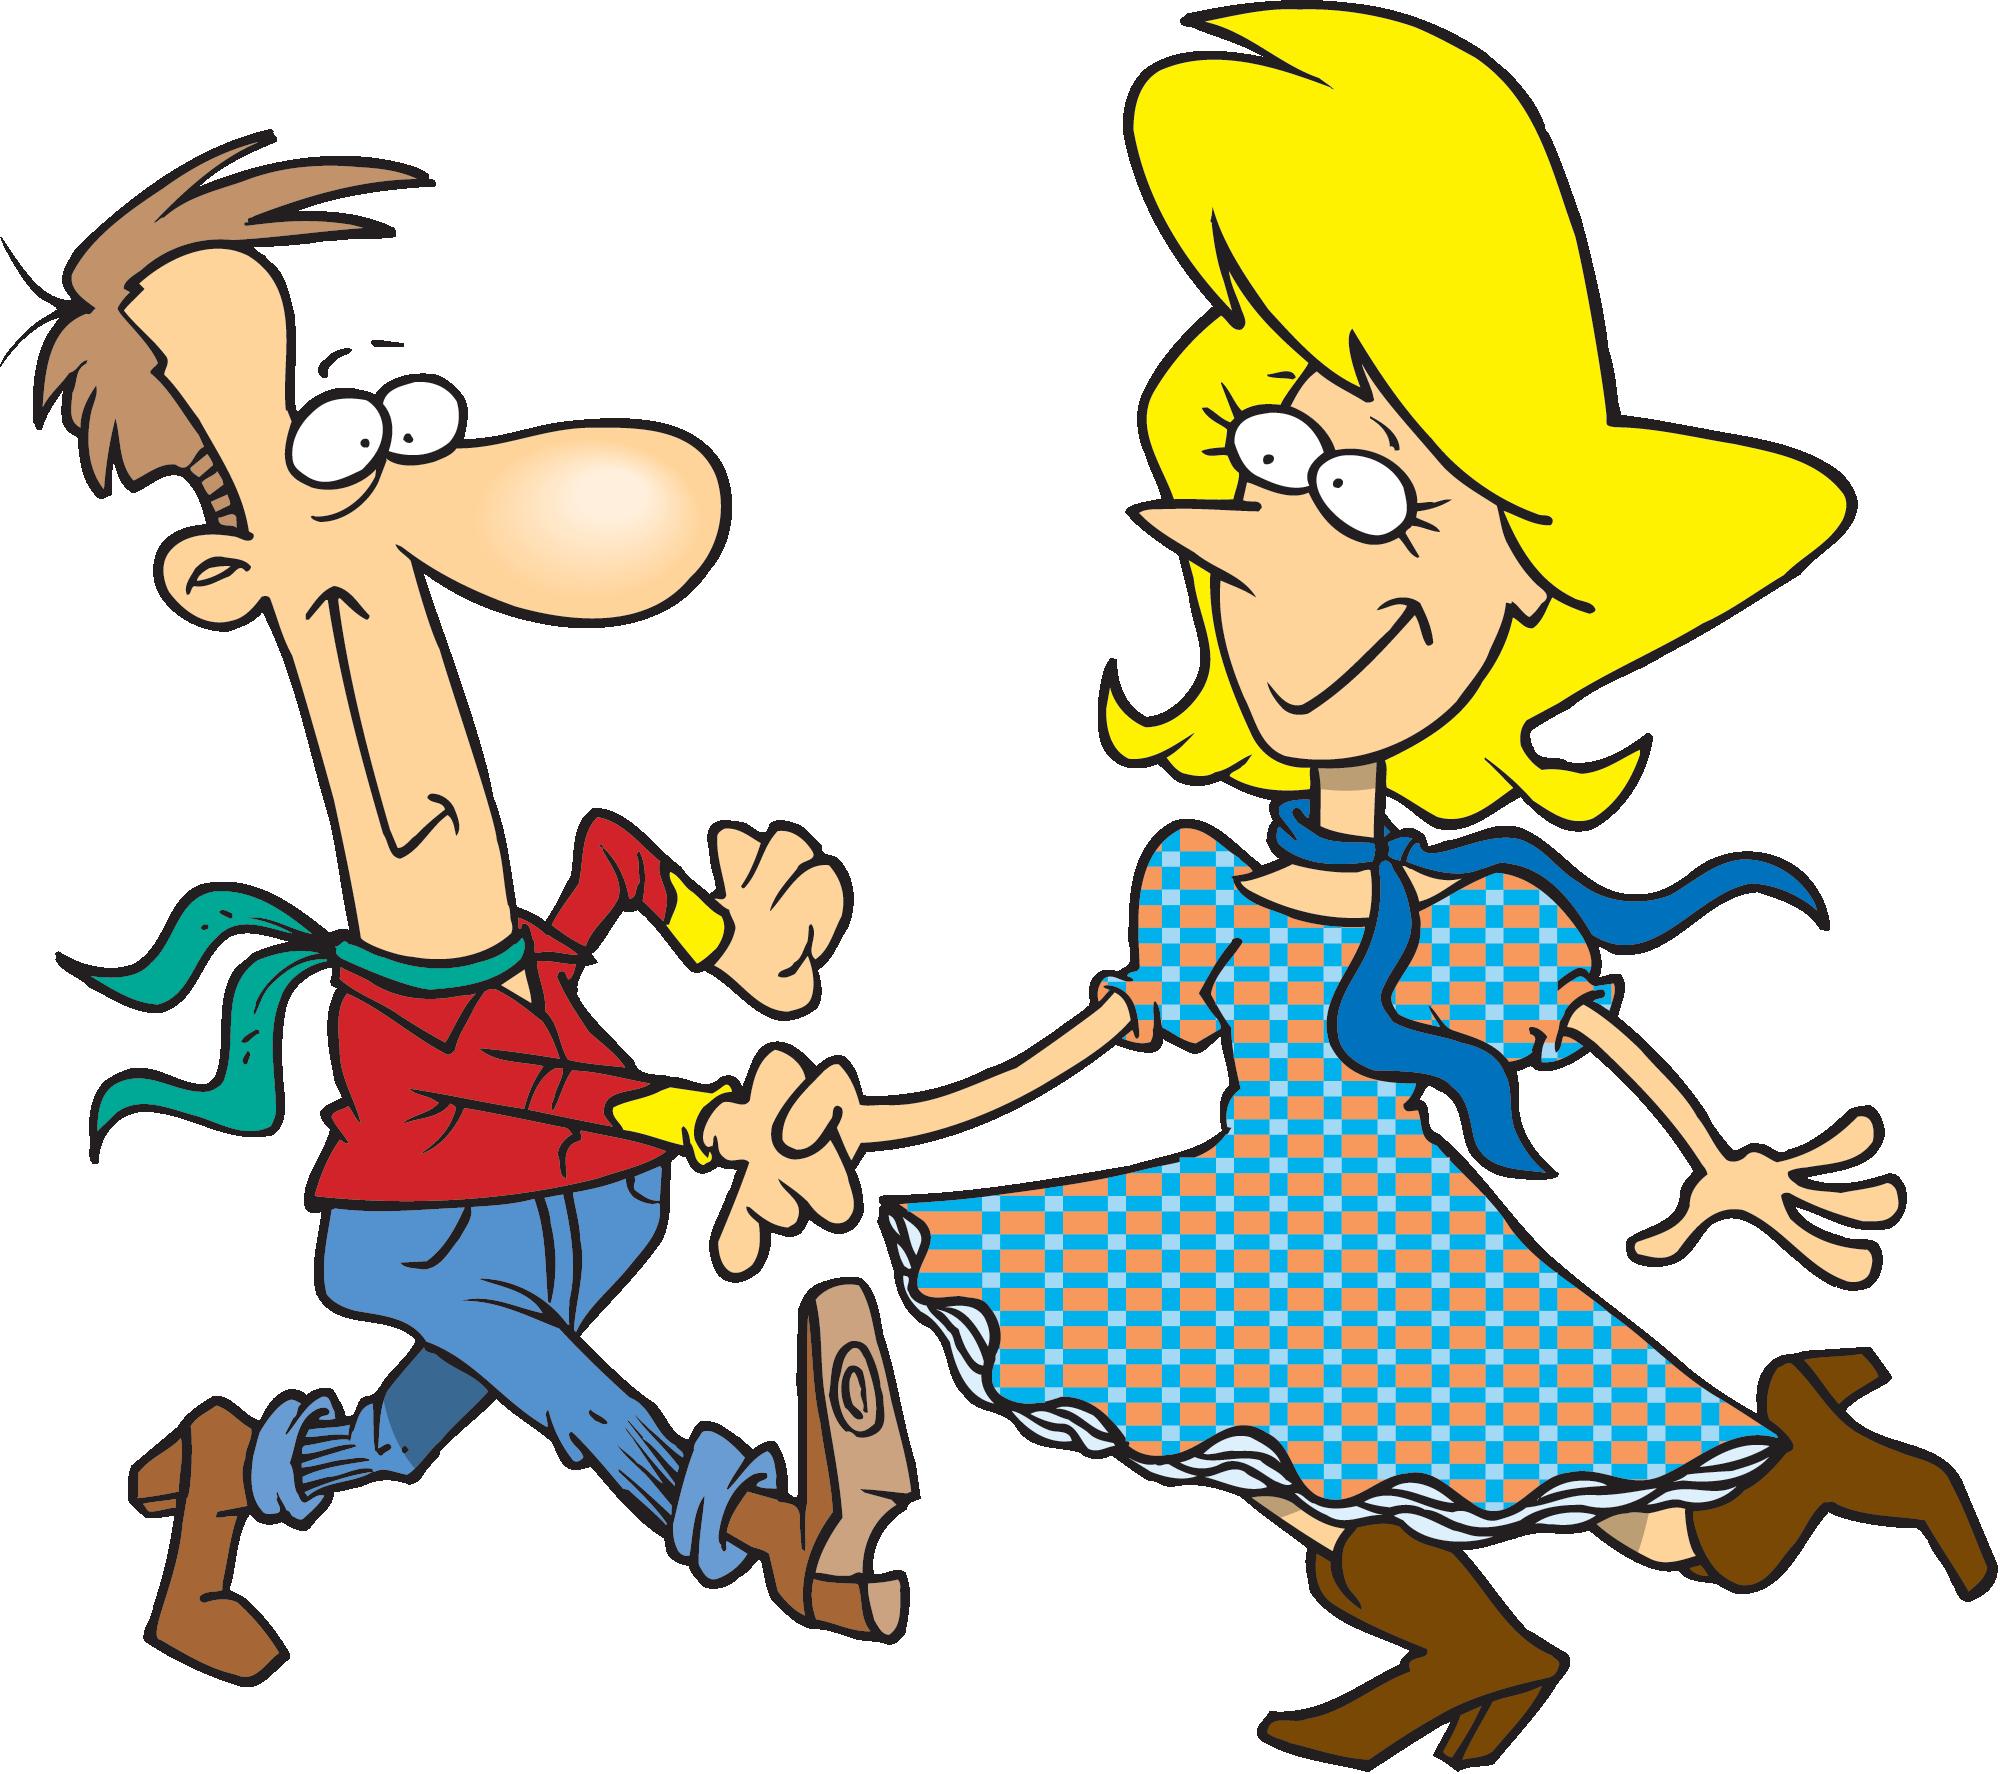 Funny Dancing Cartoon Images Images Clip Art Library Square Dancing Cartoon Clip Art Dance Poster